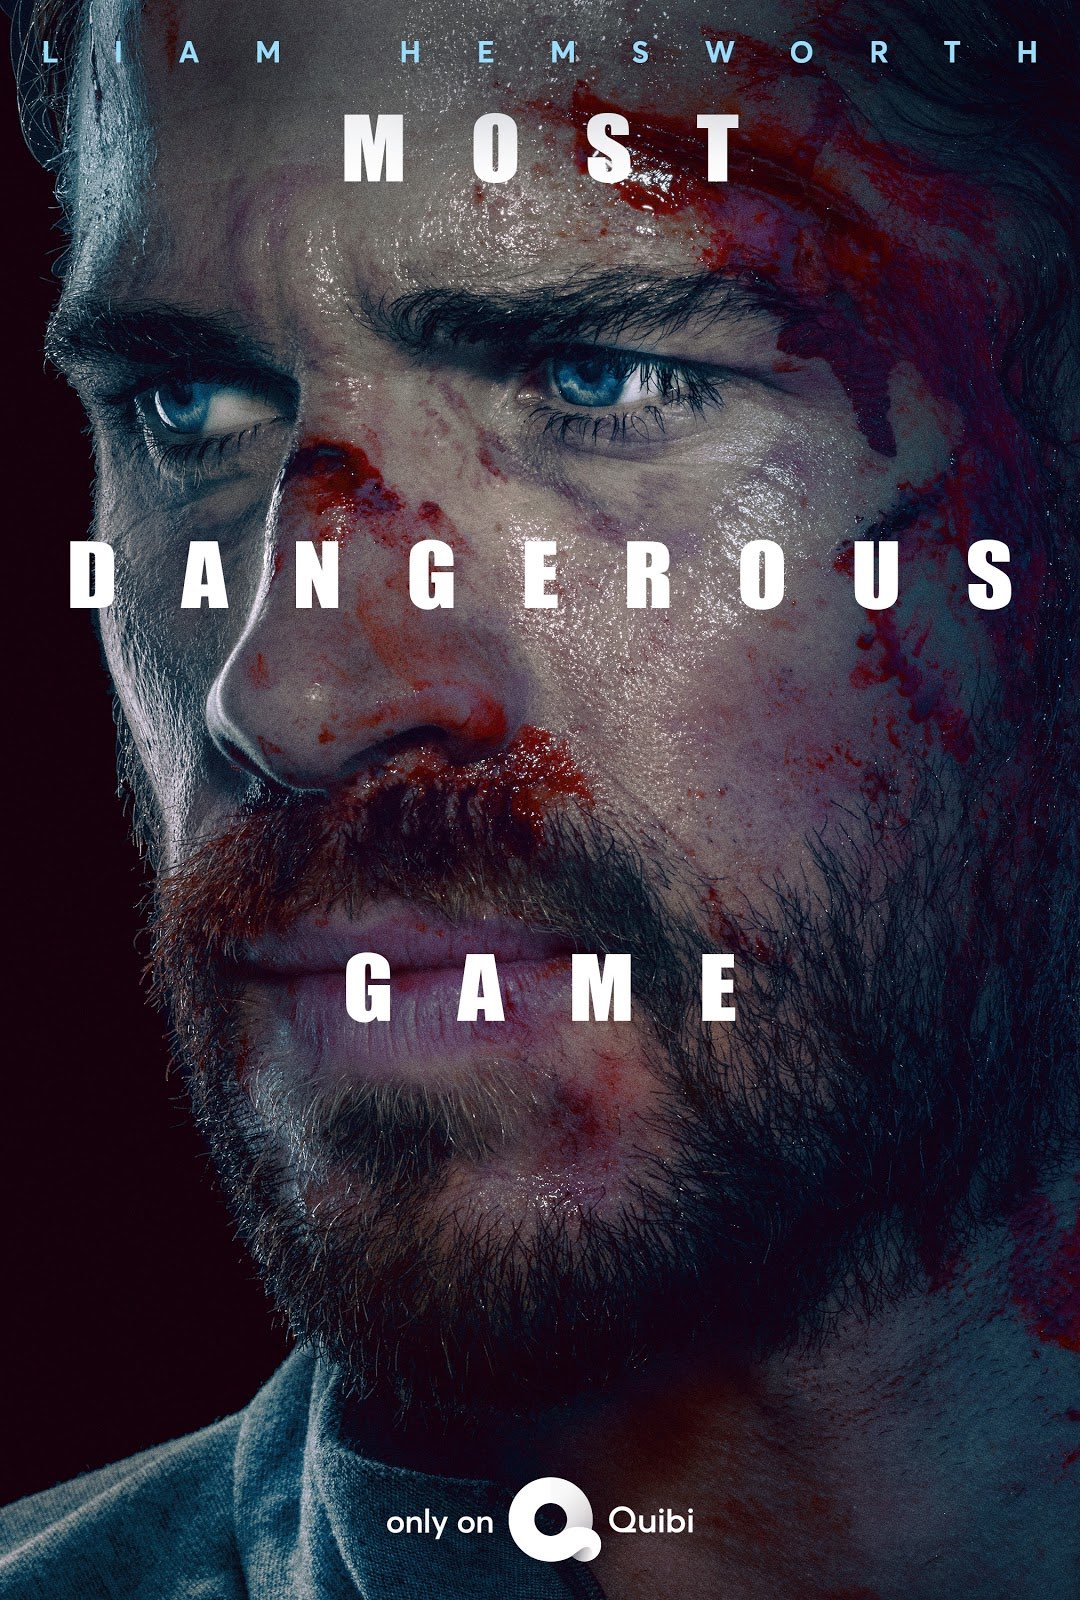 Most Dangerous Game 2020 S01 ORG Hindi Dual Audio Complete AMZN Series 480p HDRip 450MB Download